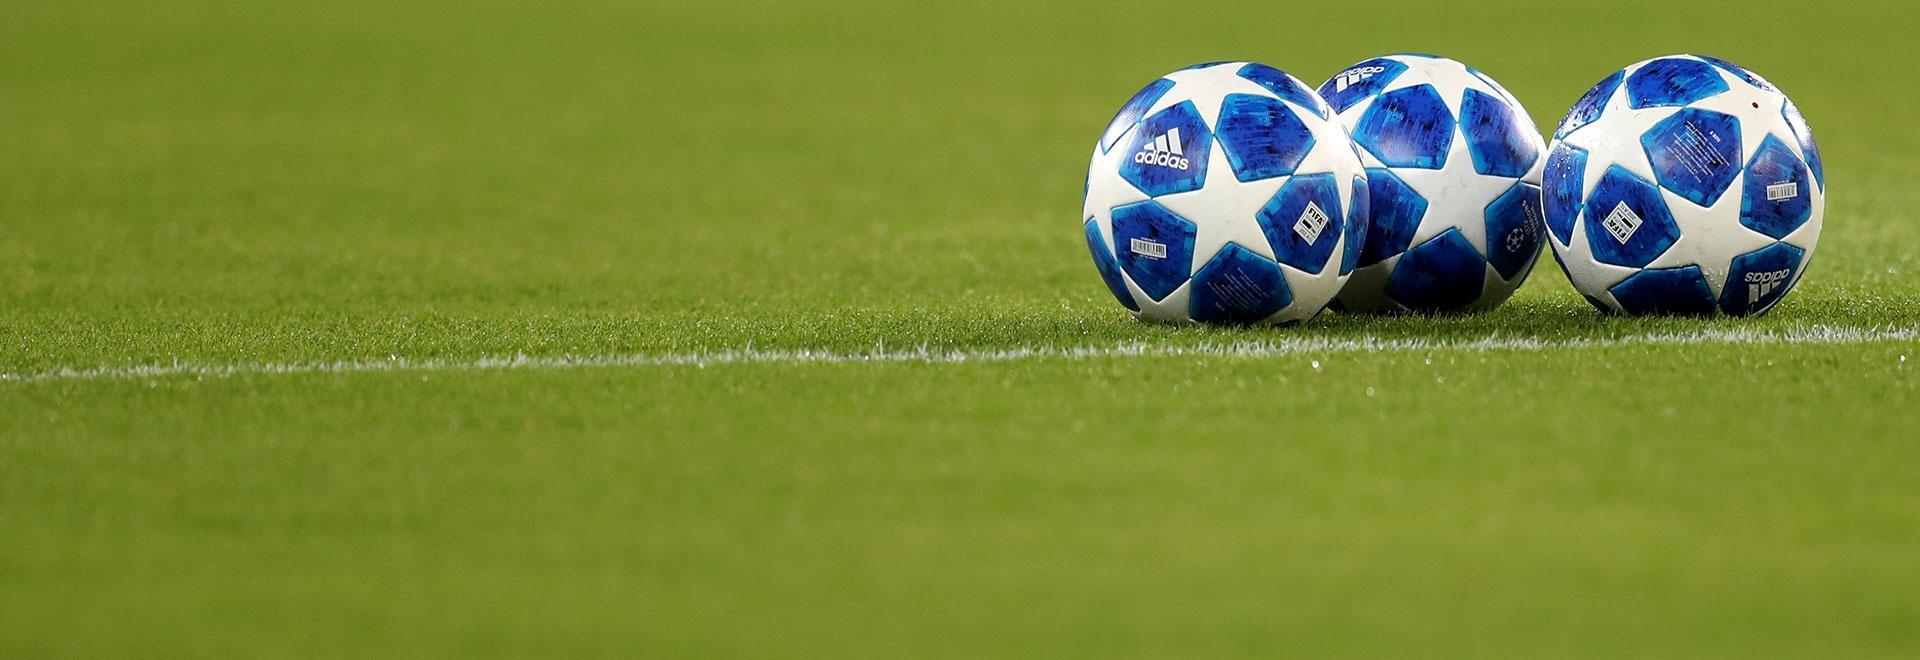 Borussia D. - Bayern M. 2013